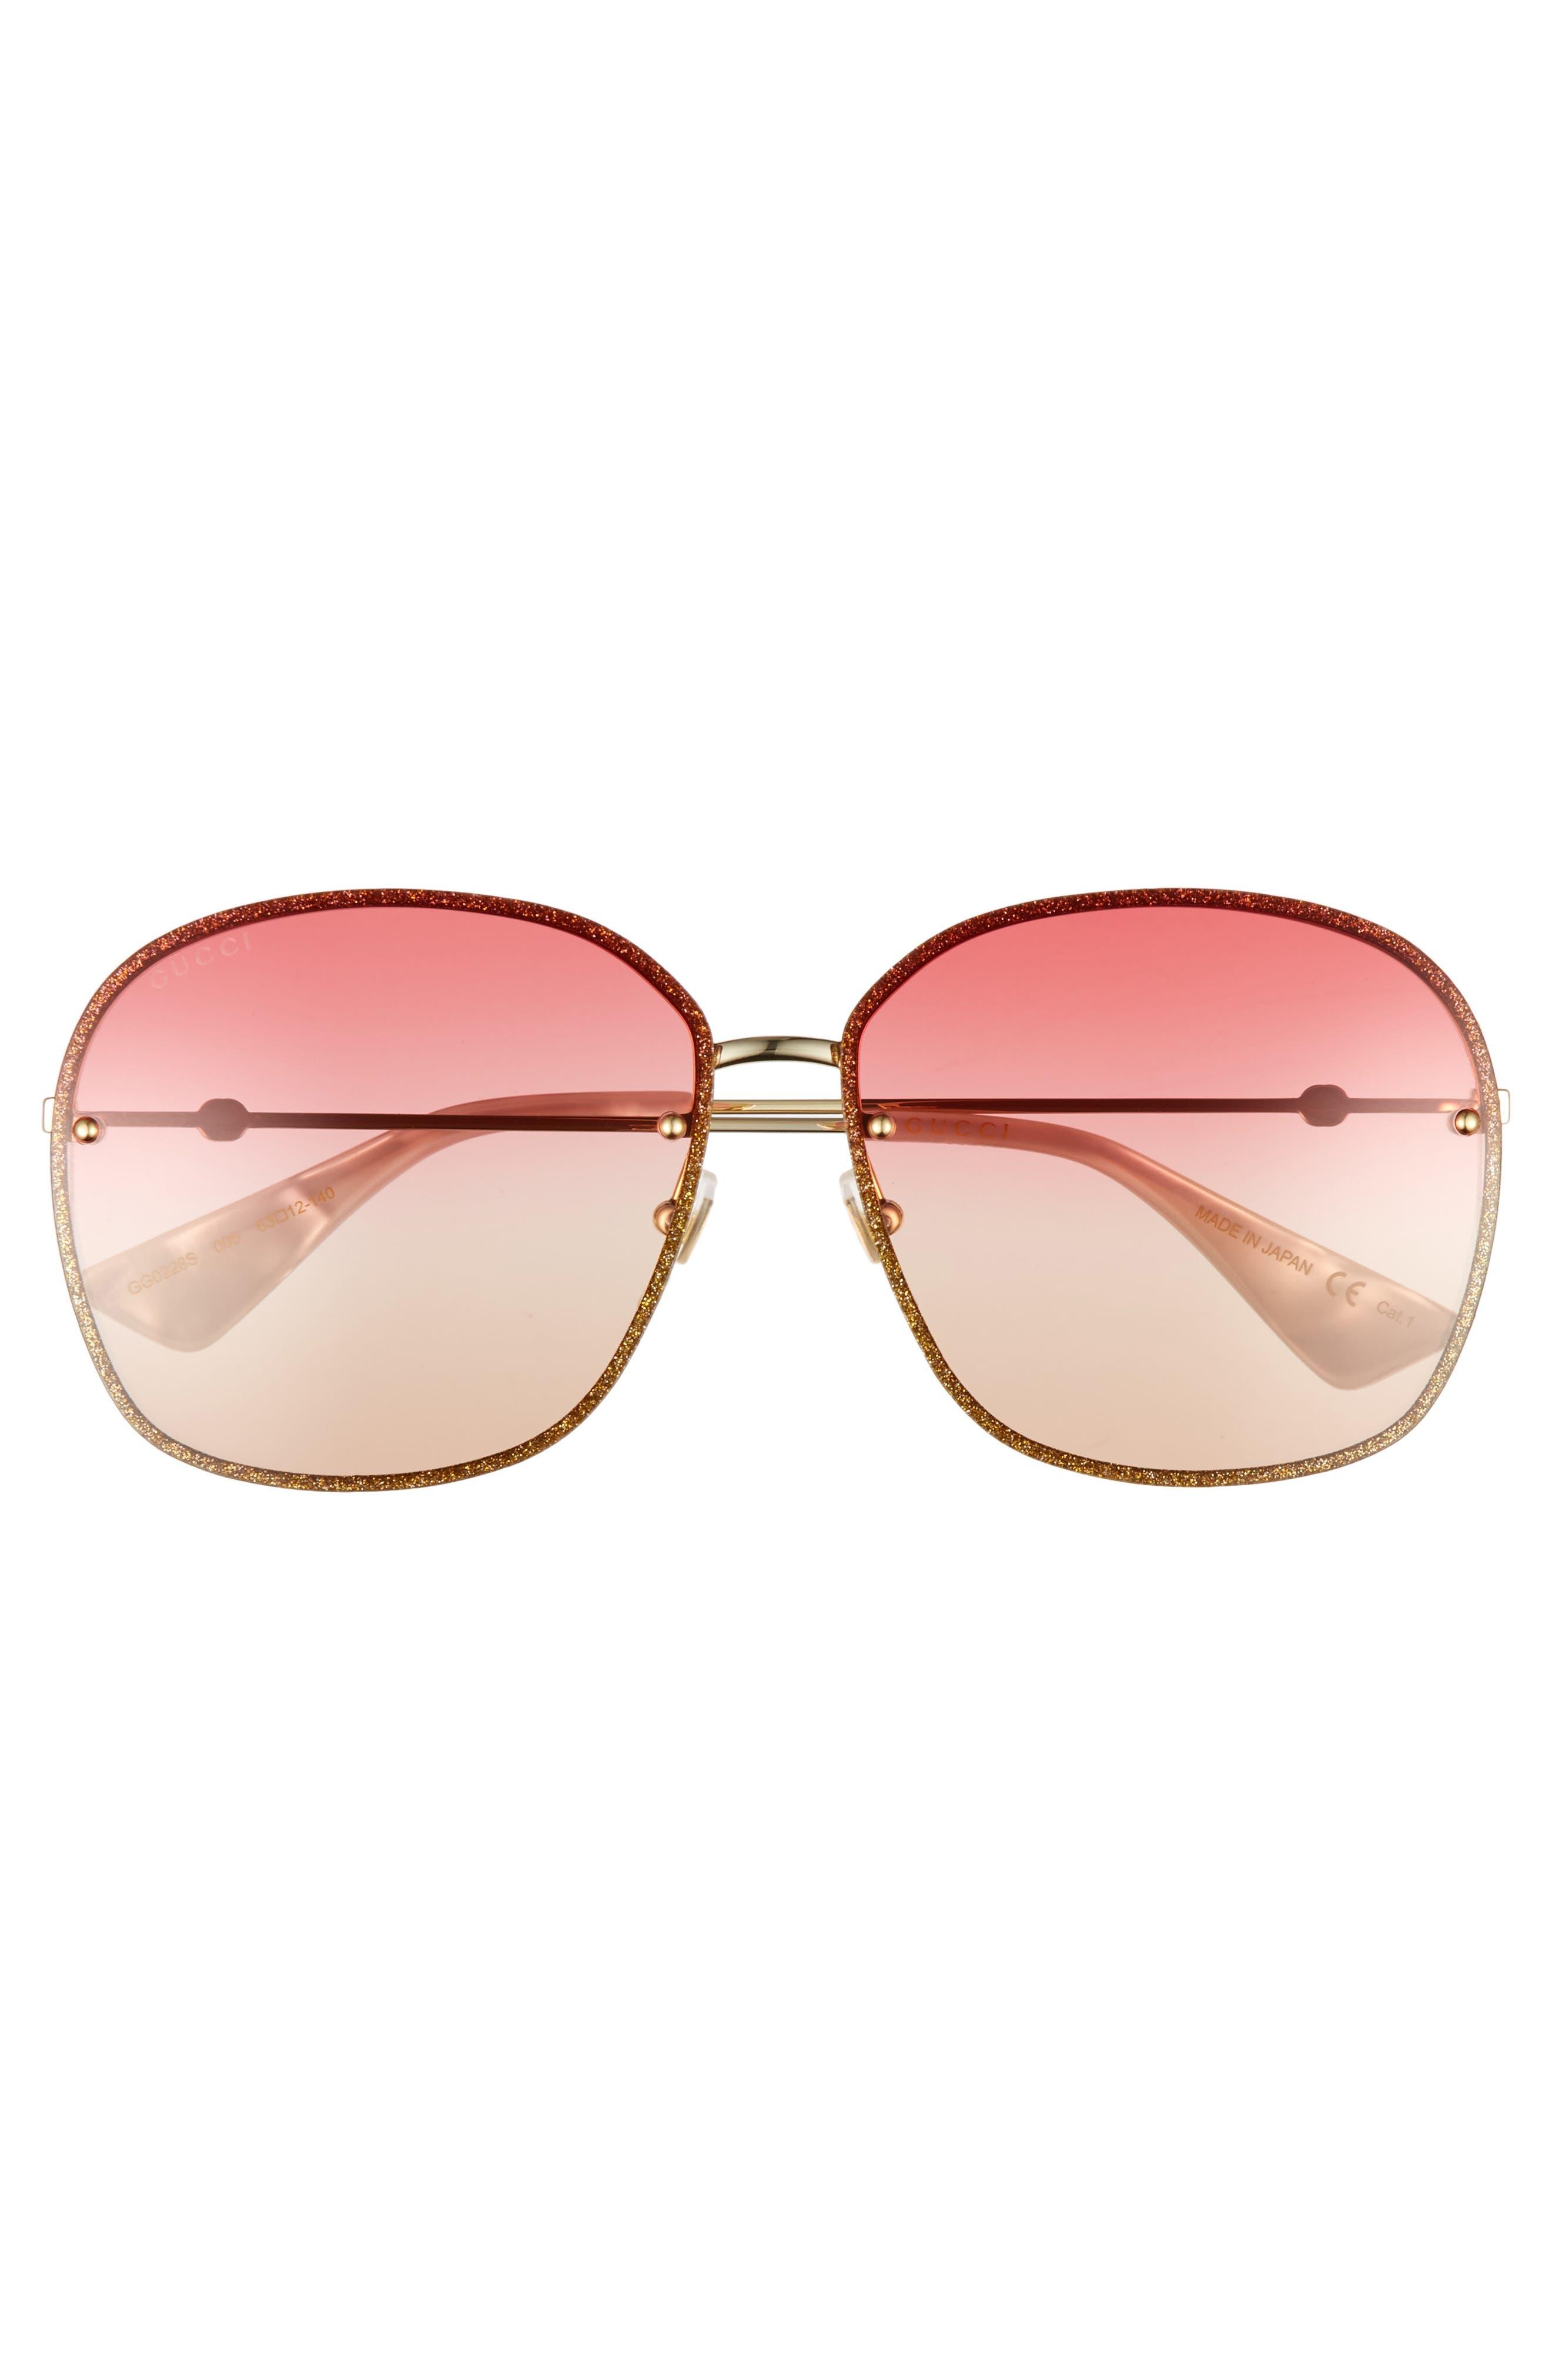 Alternate Image 3  - Gucci 63mm Oversize Square Sunglasses